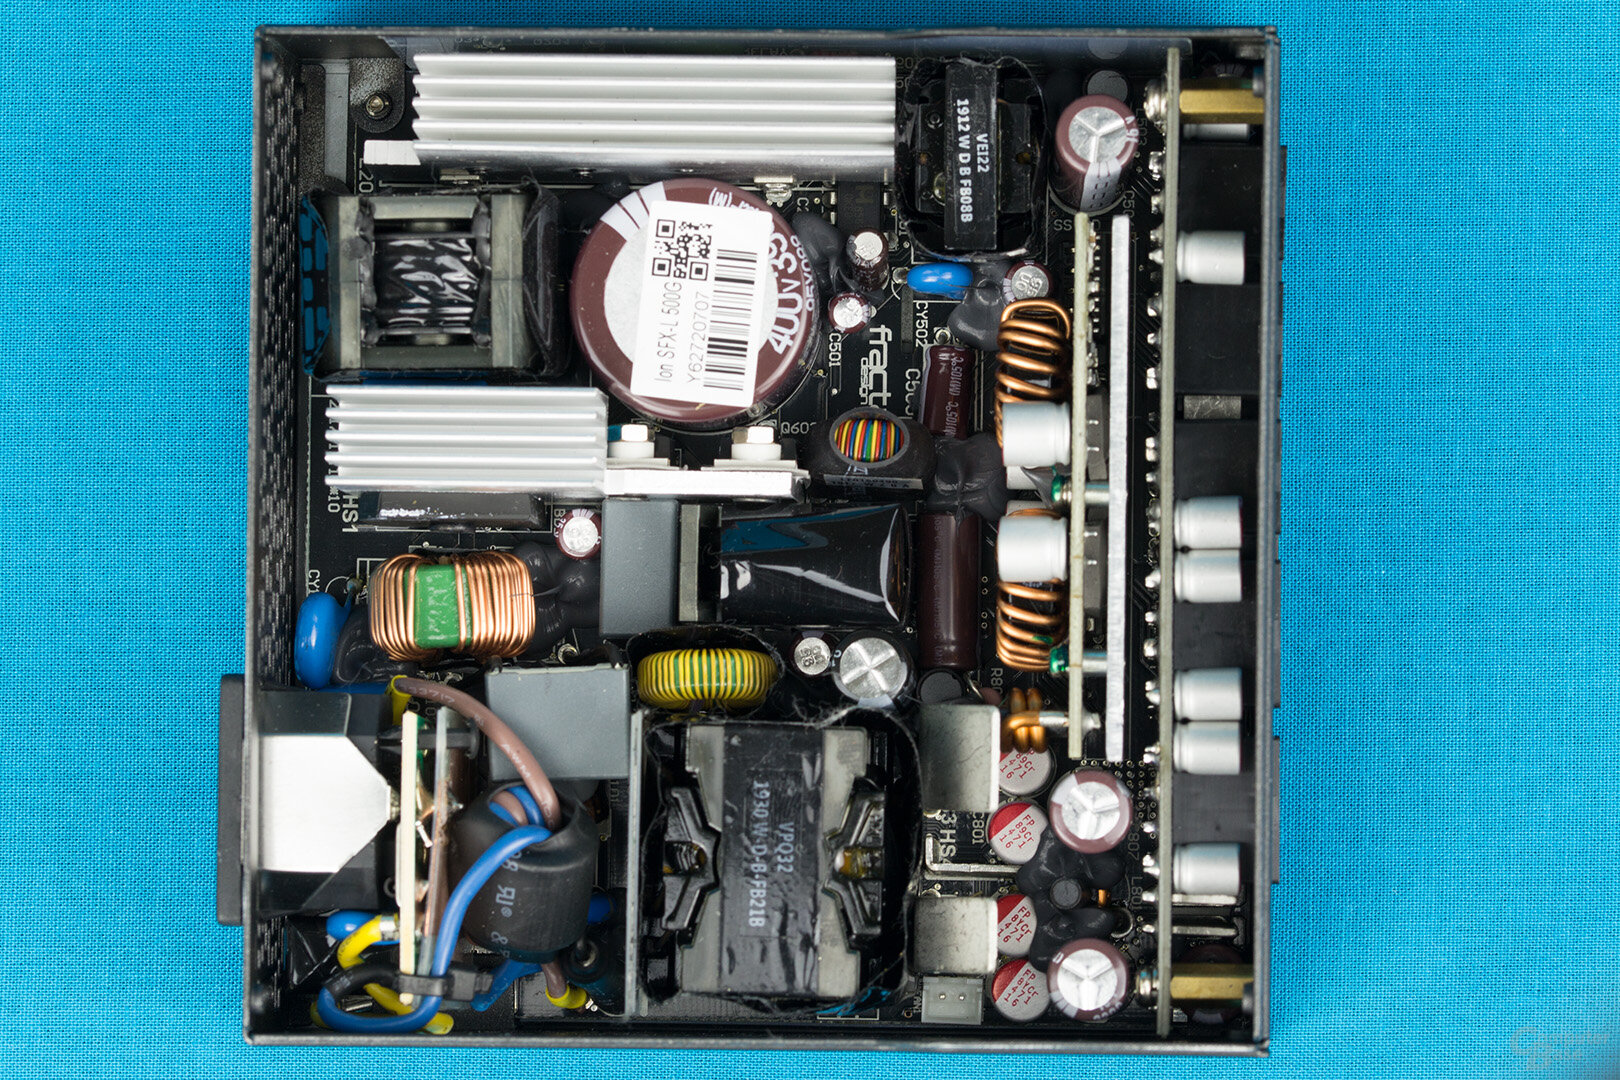 Fractal Design Ion SFX-L 500W Gold